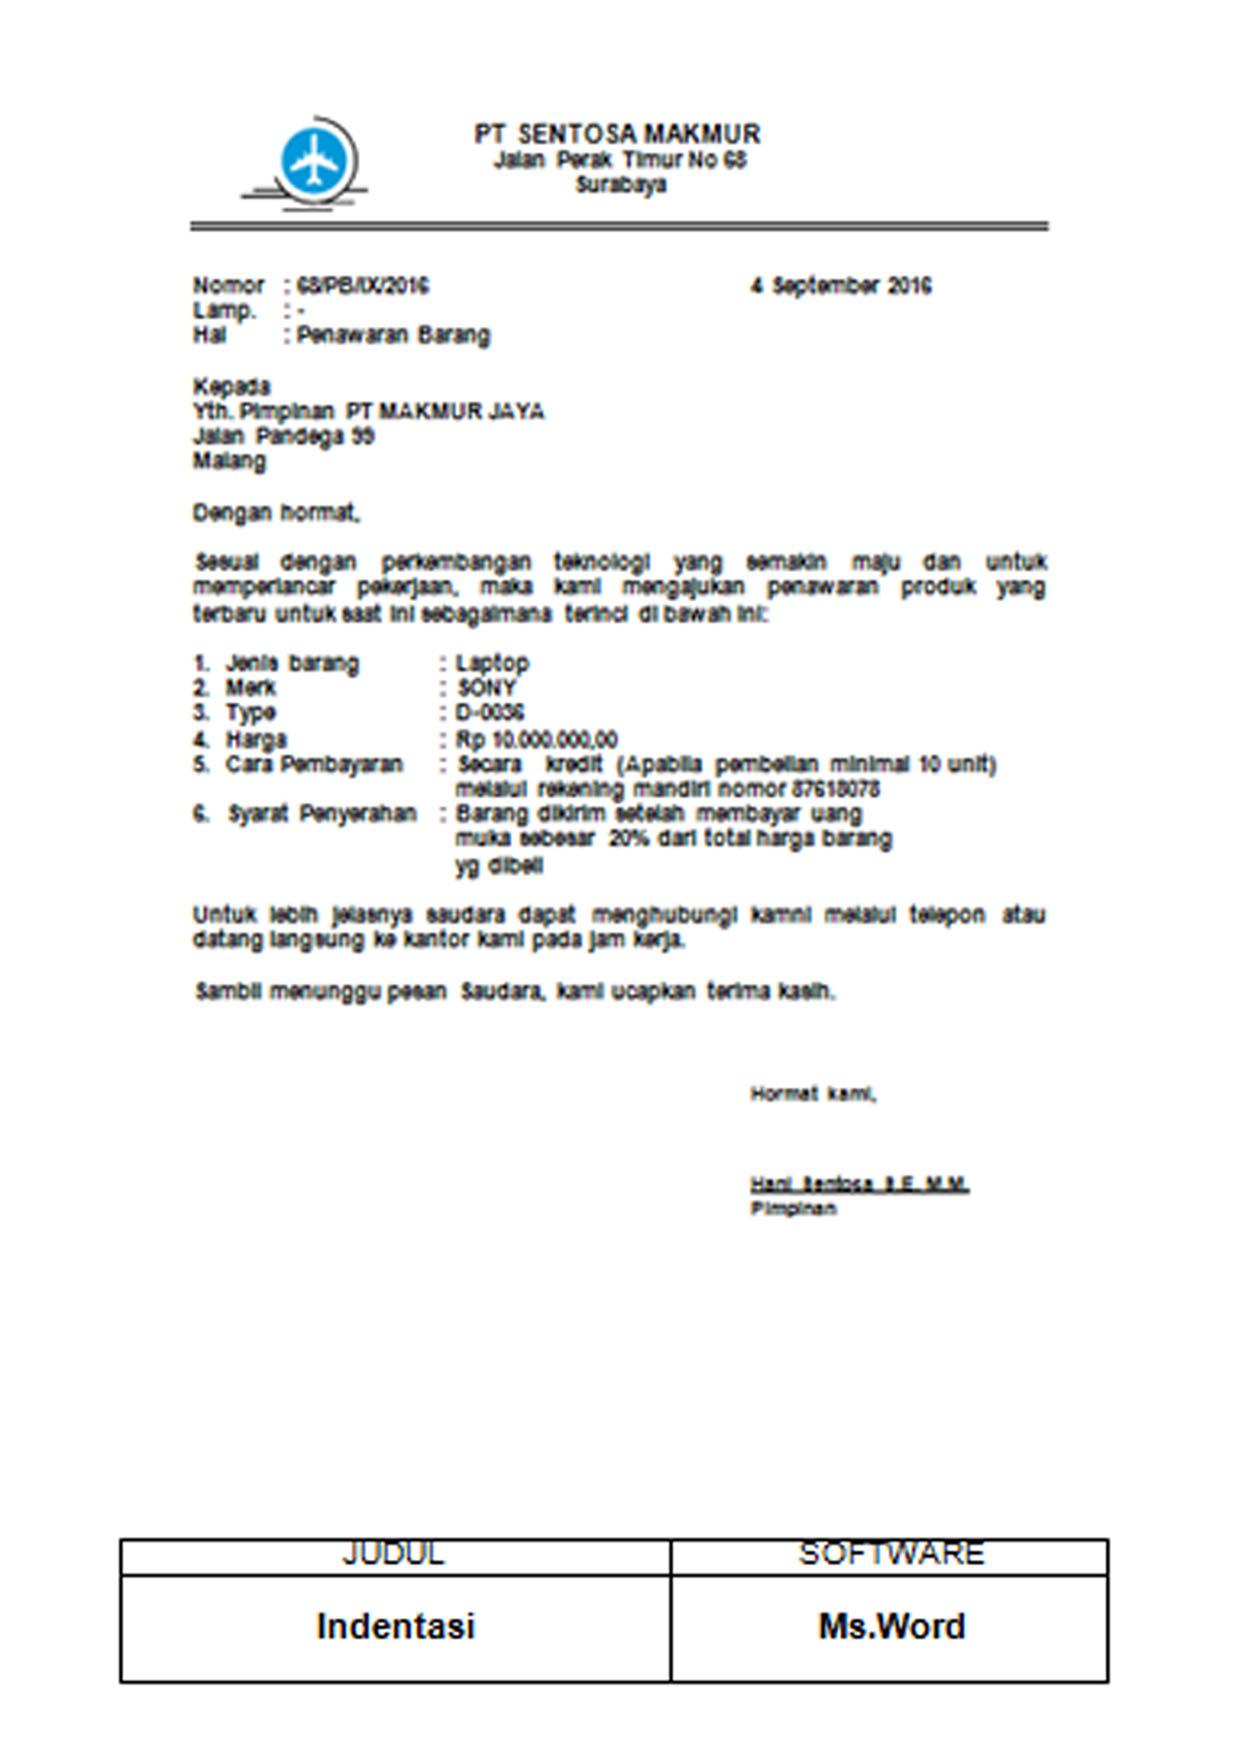 Kursus Online Komputer Surabaya - Program Aplikasi Perkantoran - Hasil Karya NASKAH INDENTASI